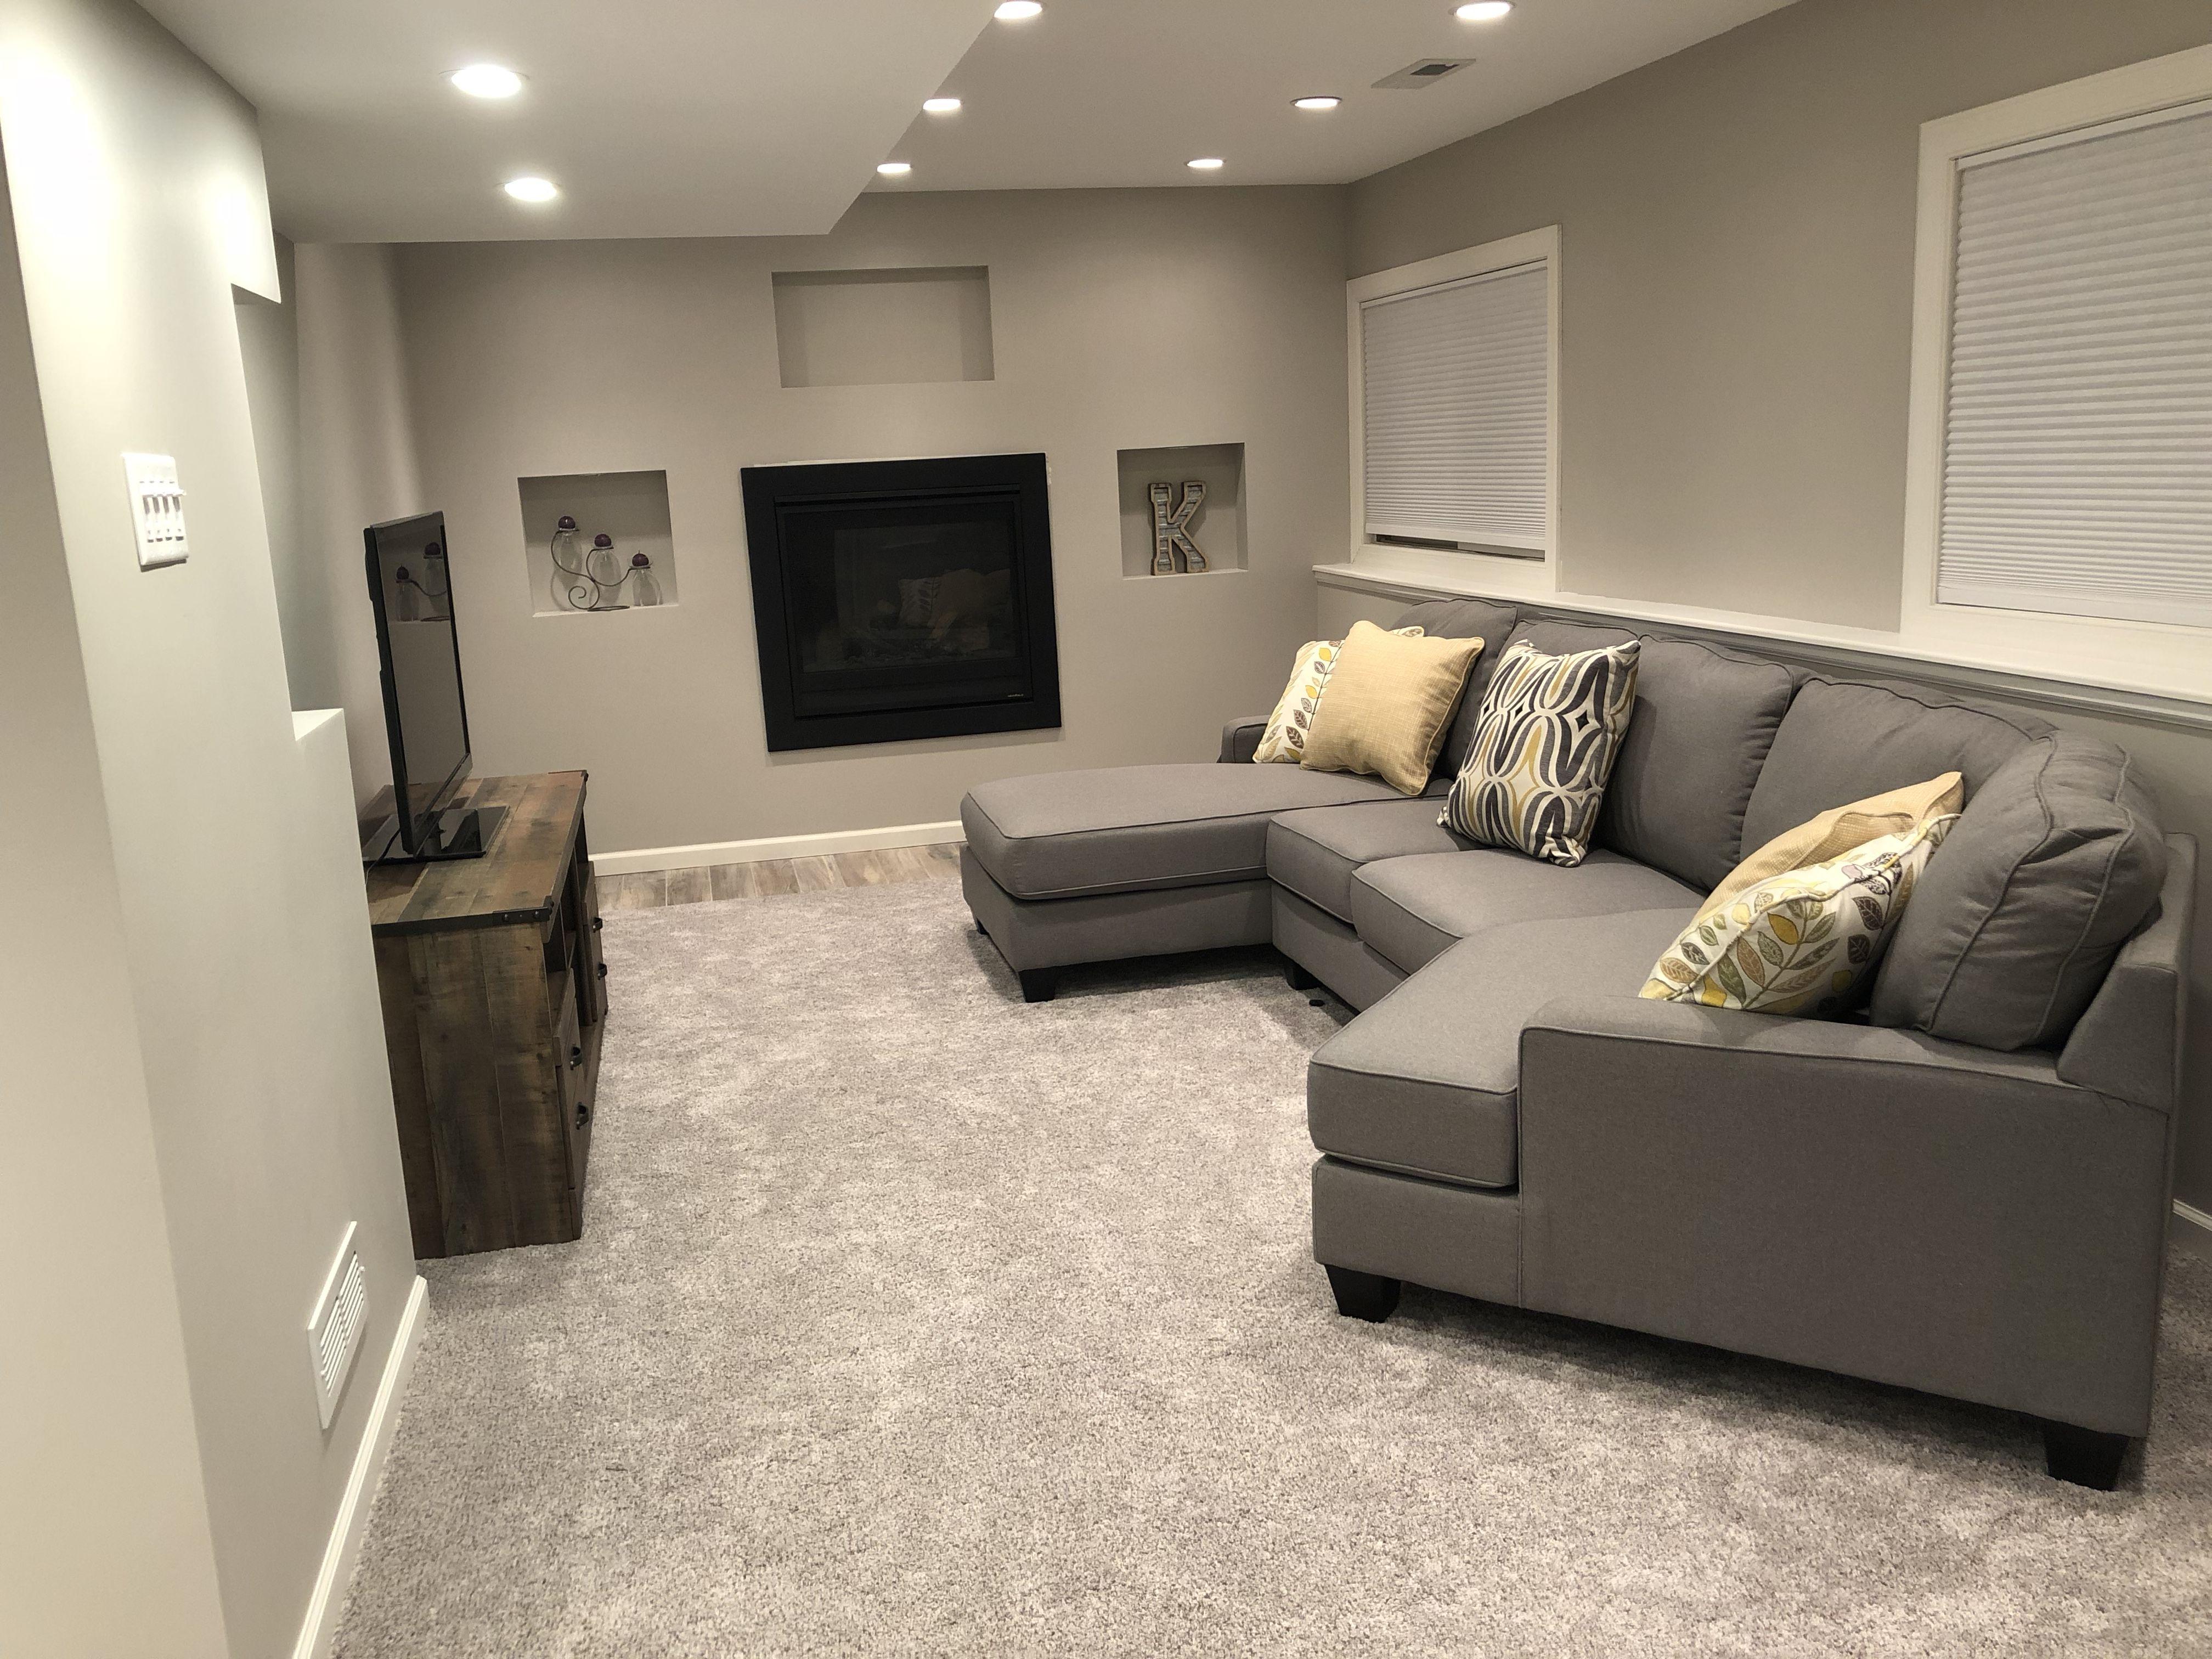 Long narrow basement family room. Minimalist. Gray sectional